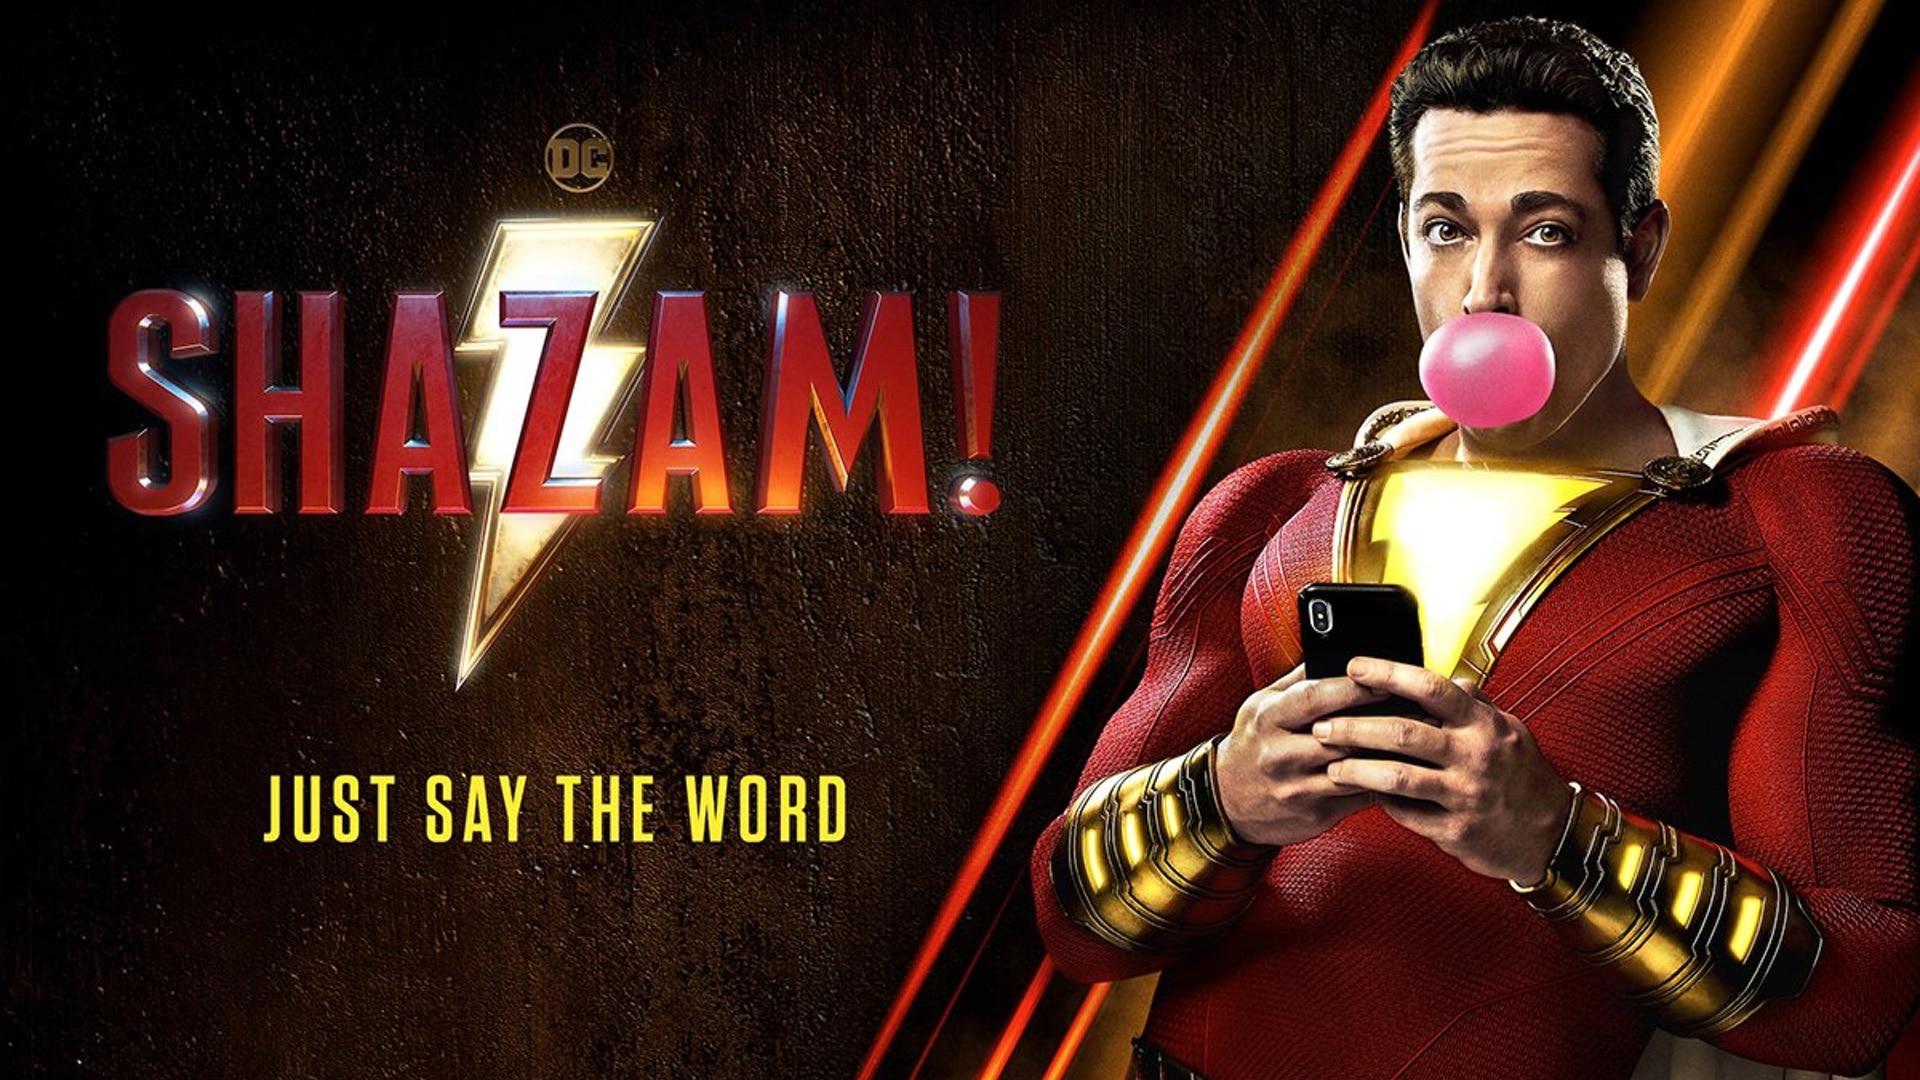 Shazam film header